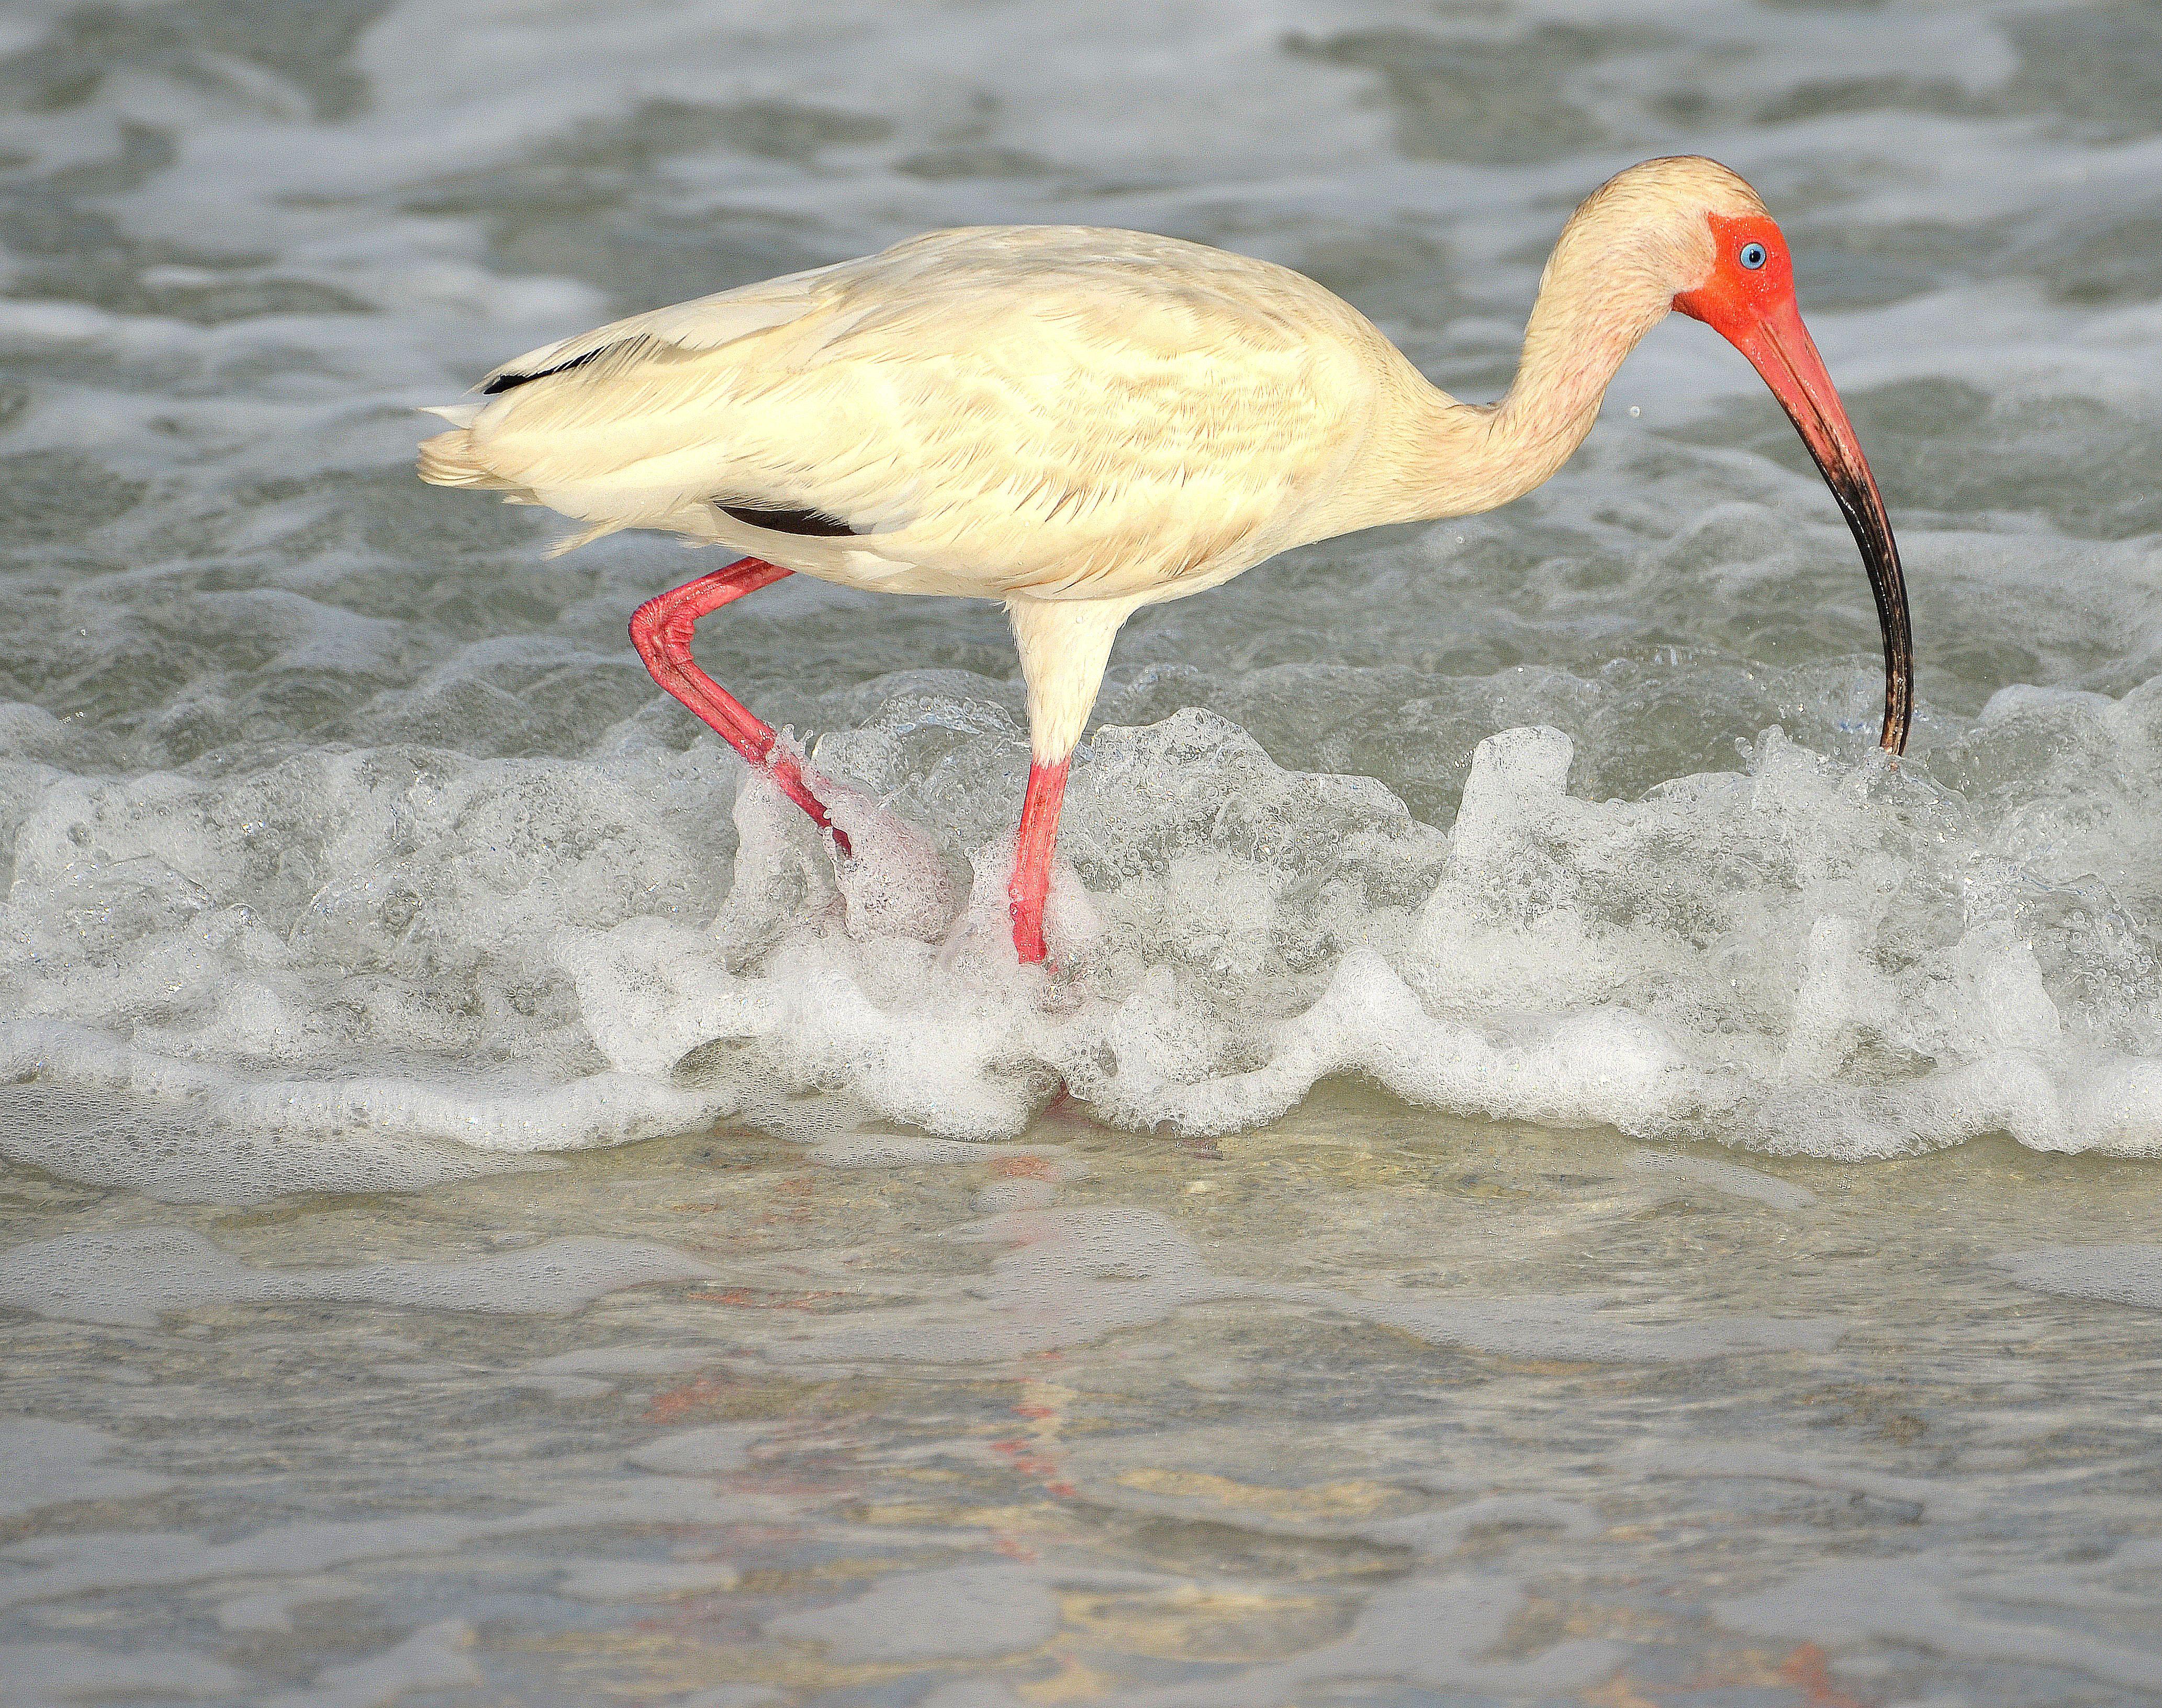 12+ Gulf of mexico animals ideas